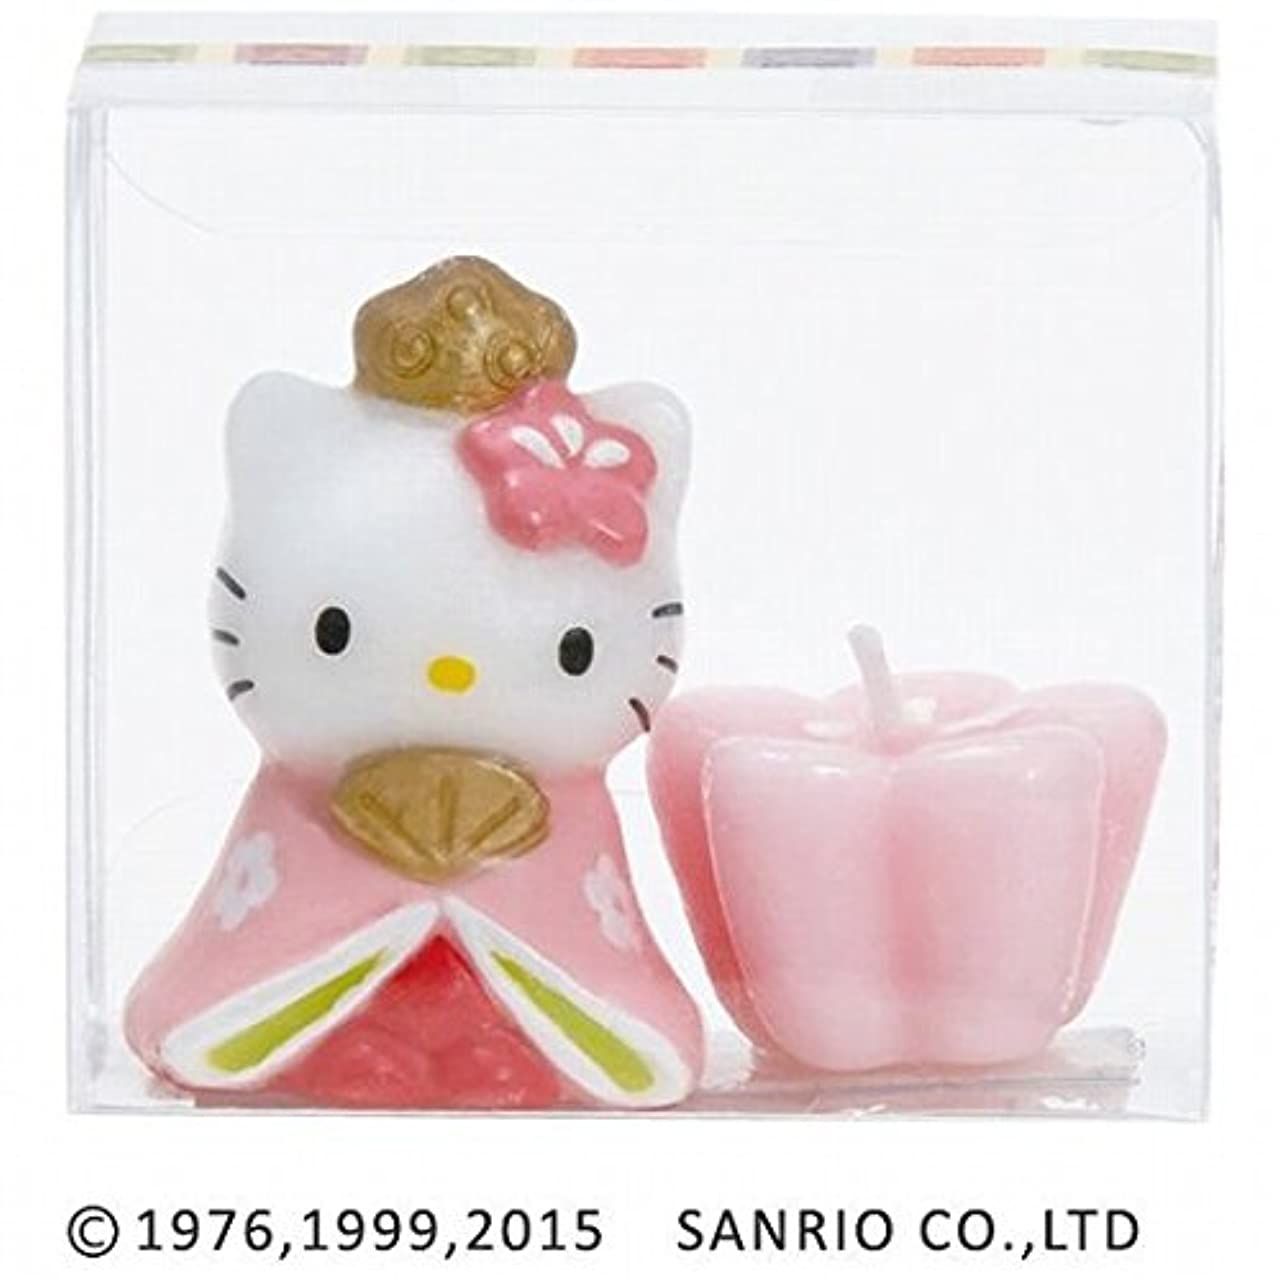 kameyama candle(カメヤマキャンドル) ハローキティひな祭りキャンドル 「 おひなさま 」(56270000)